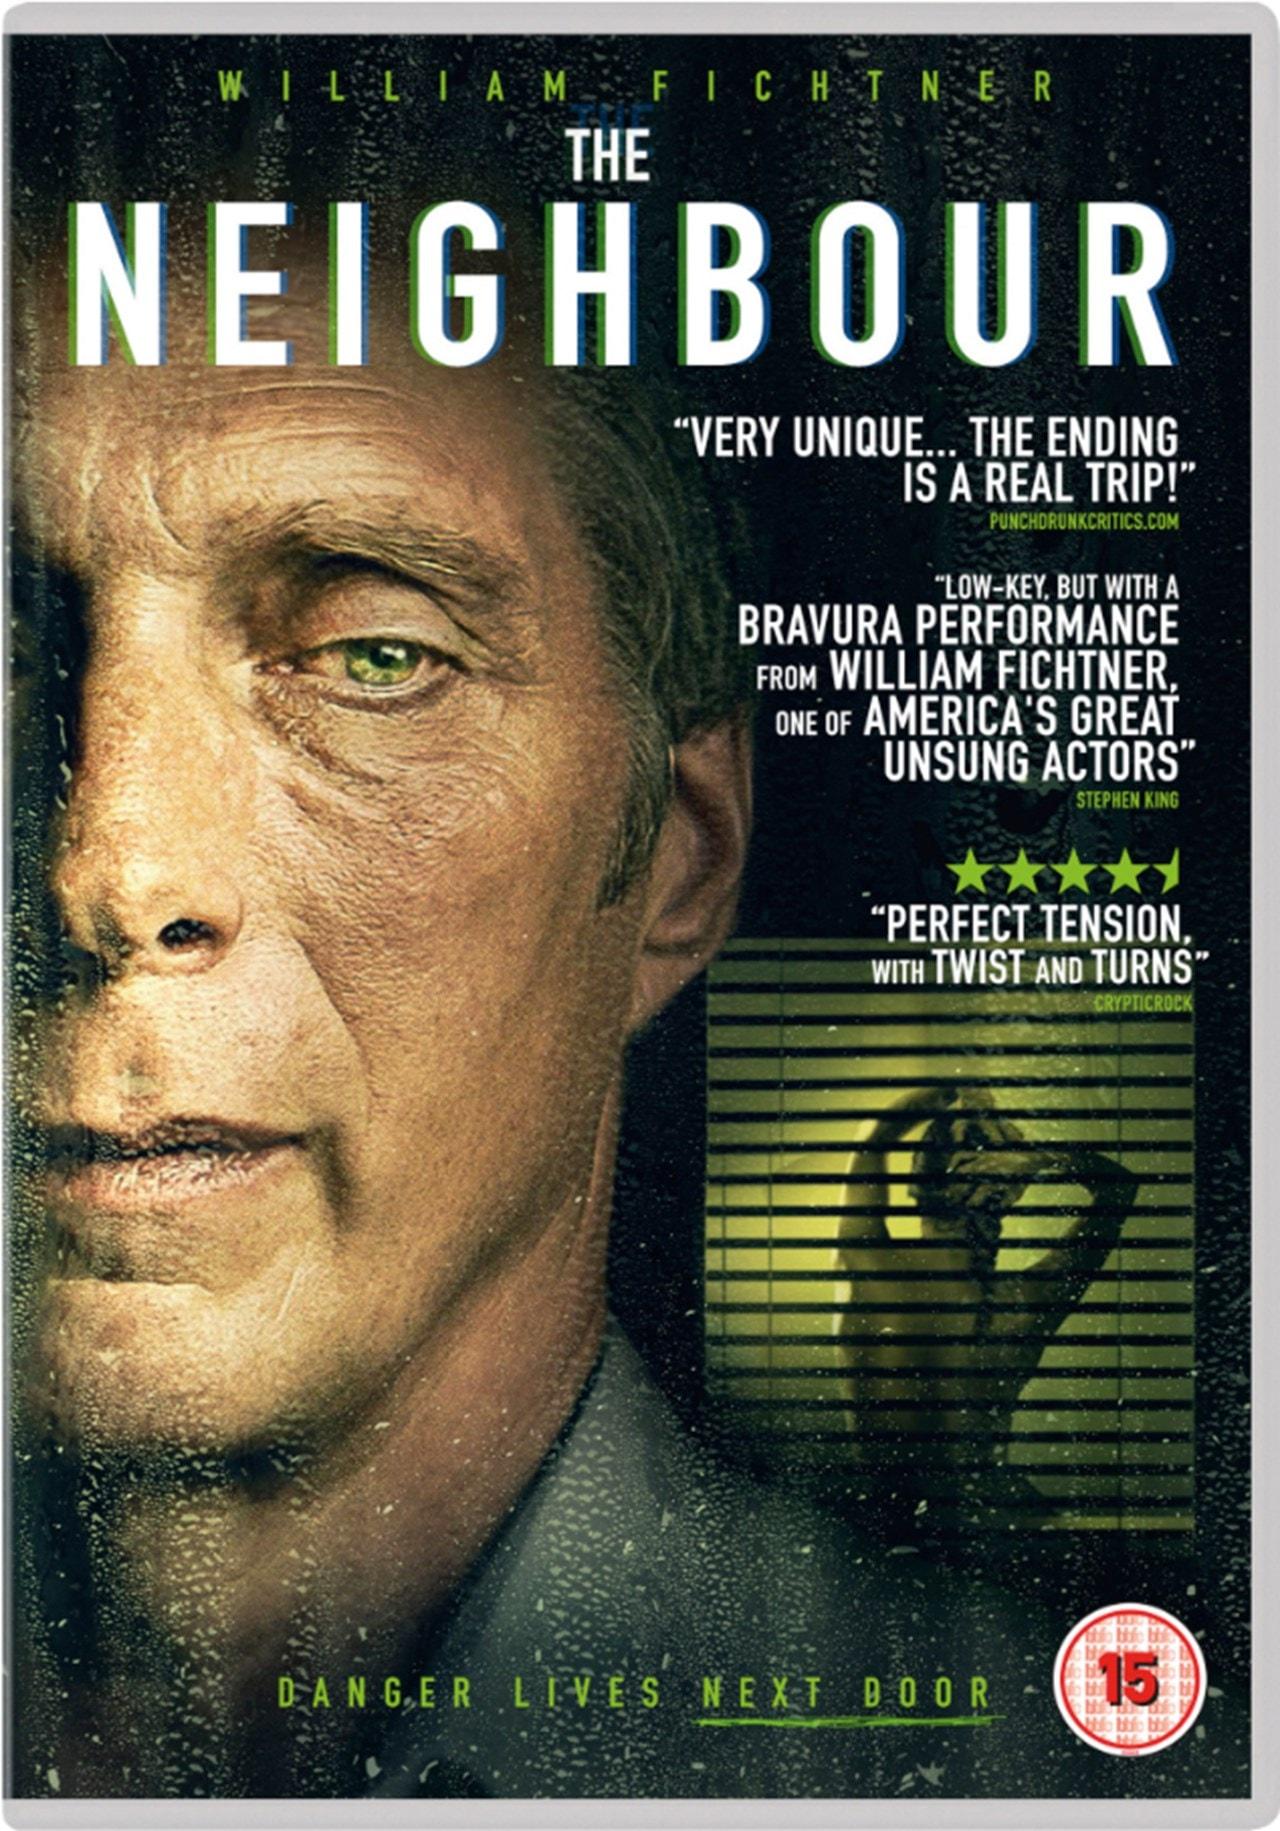 The Neighbour - 1